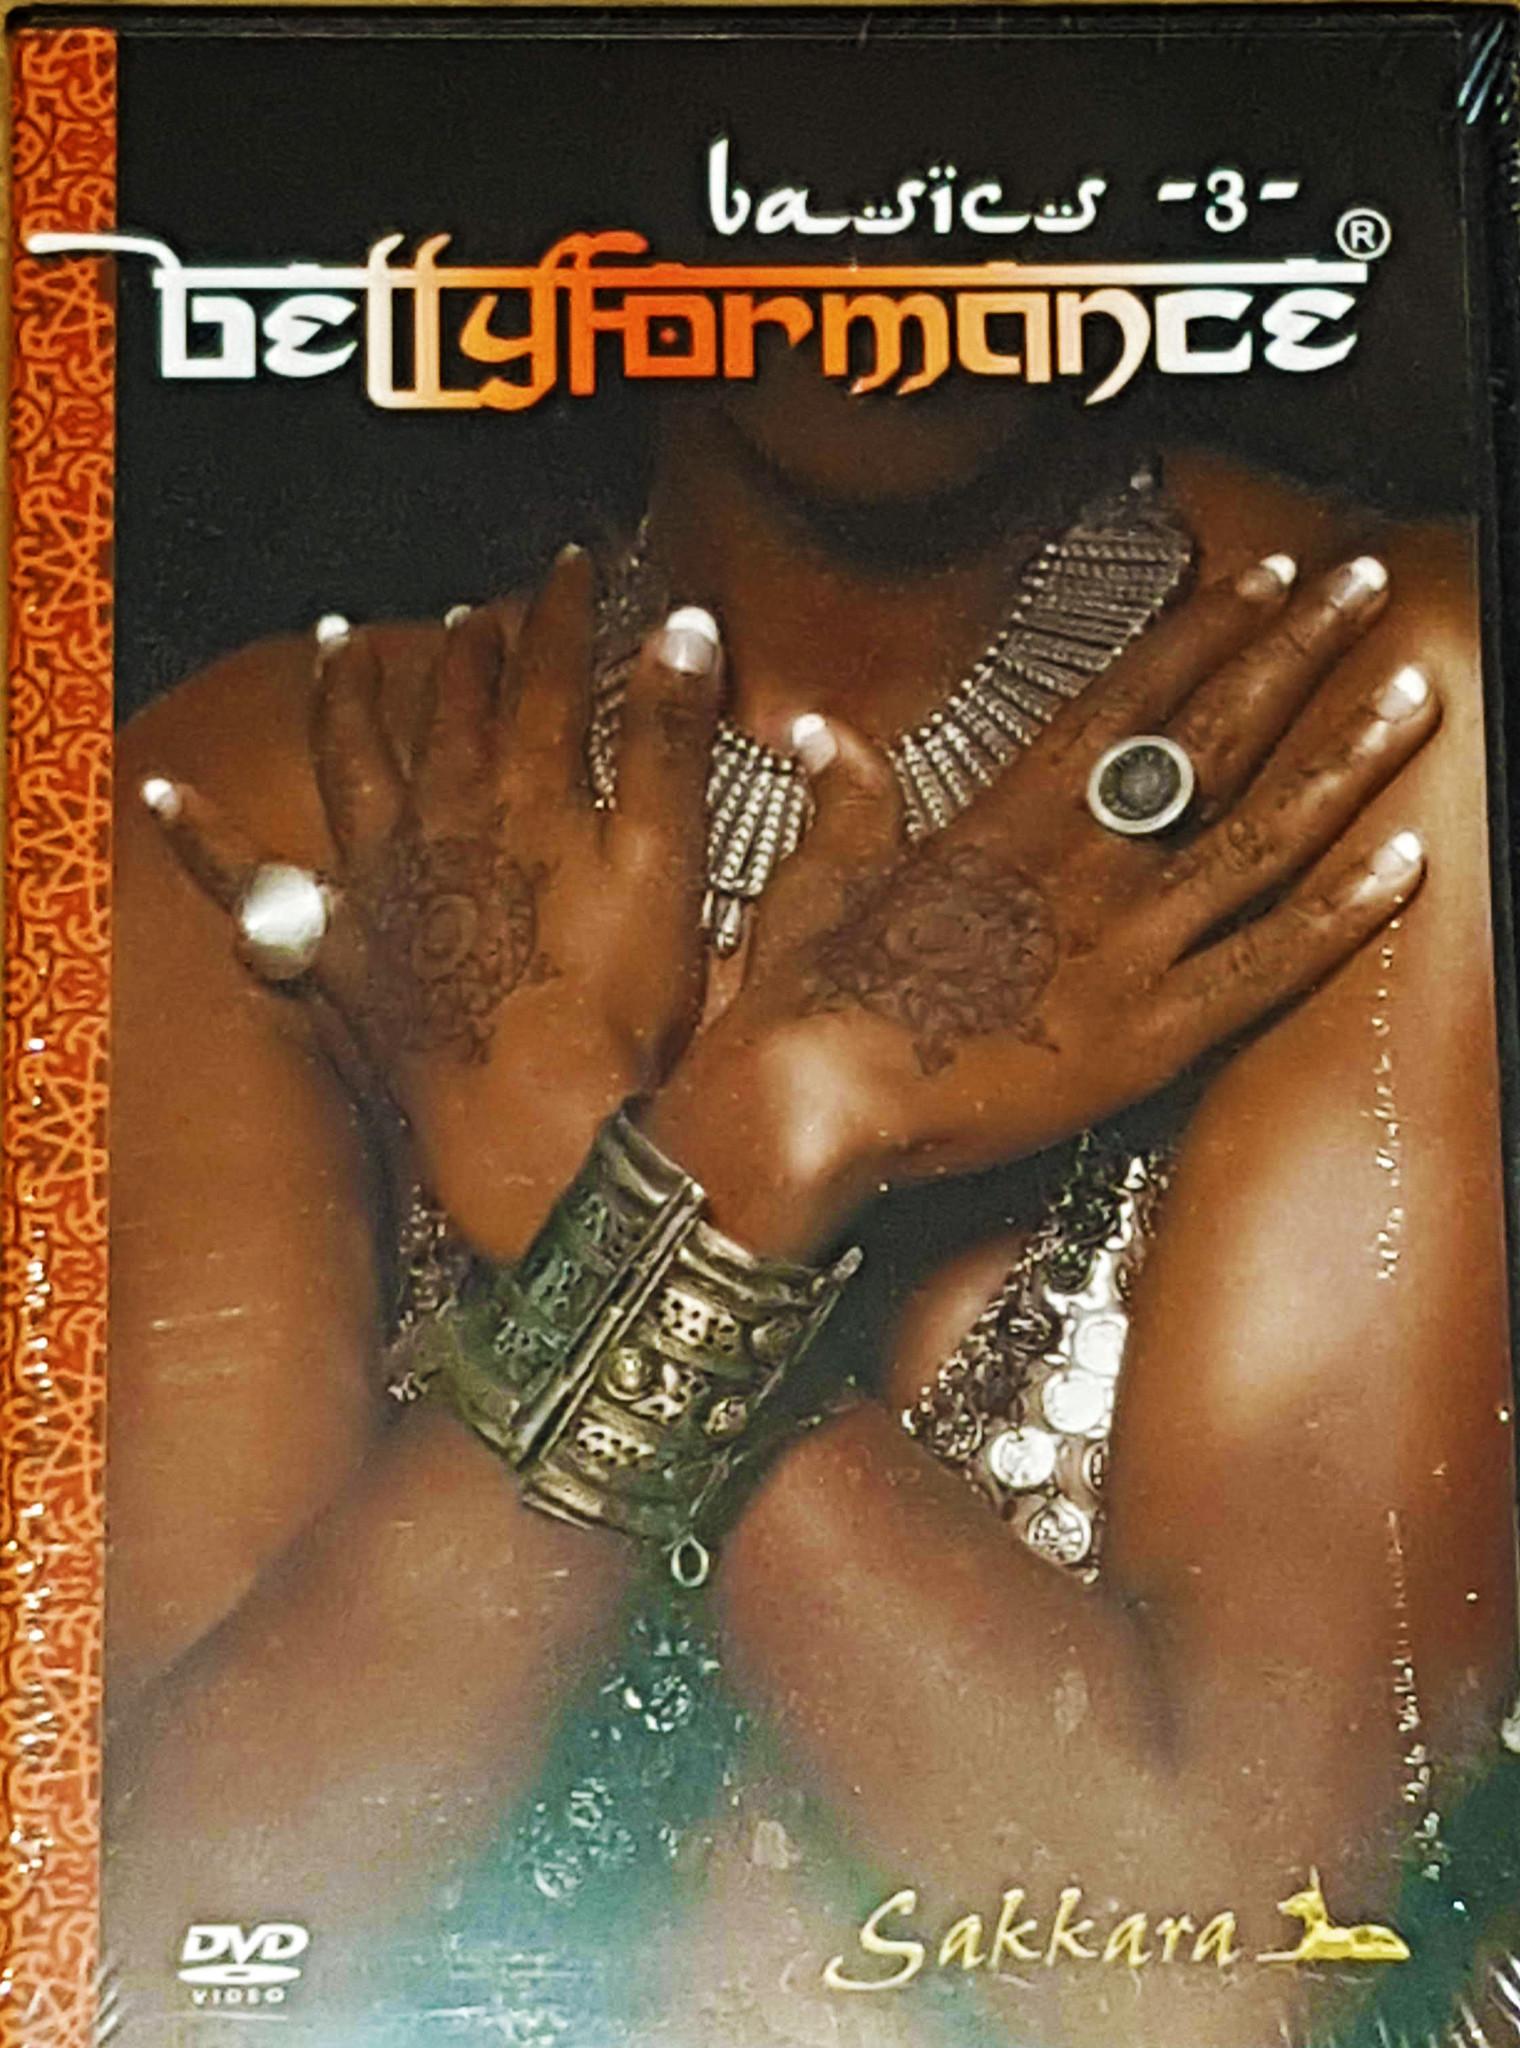 Bellyformance-DVD Basics 3